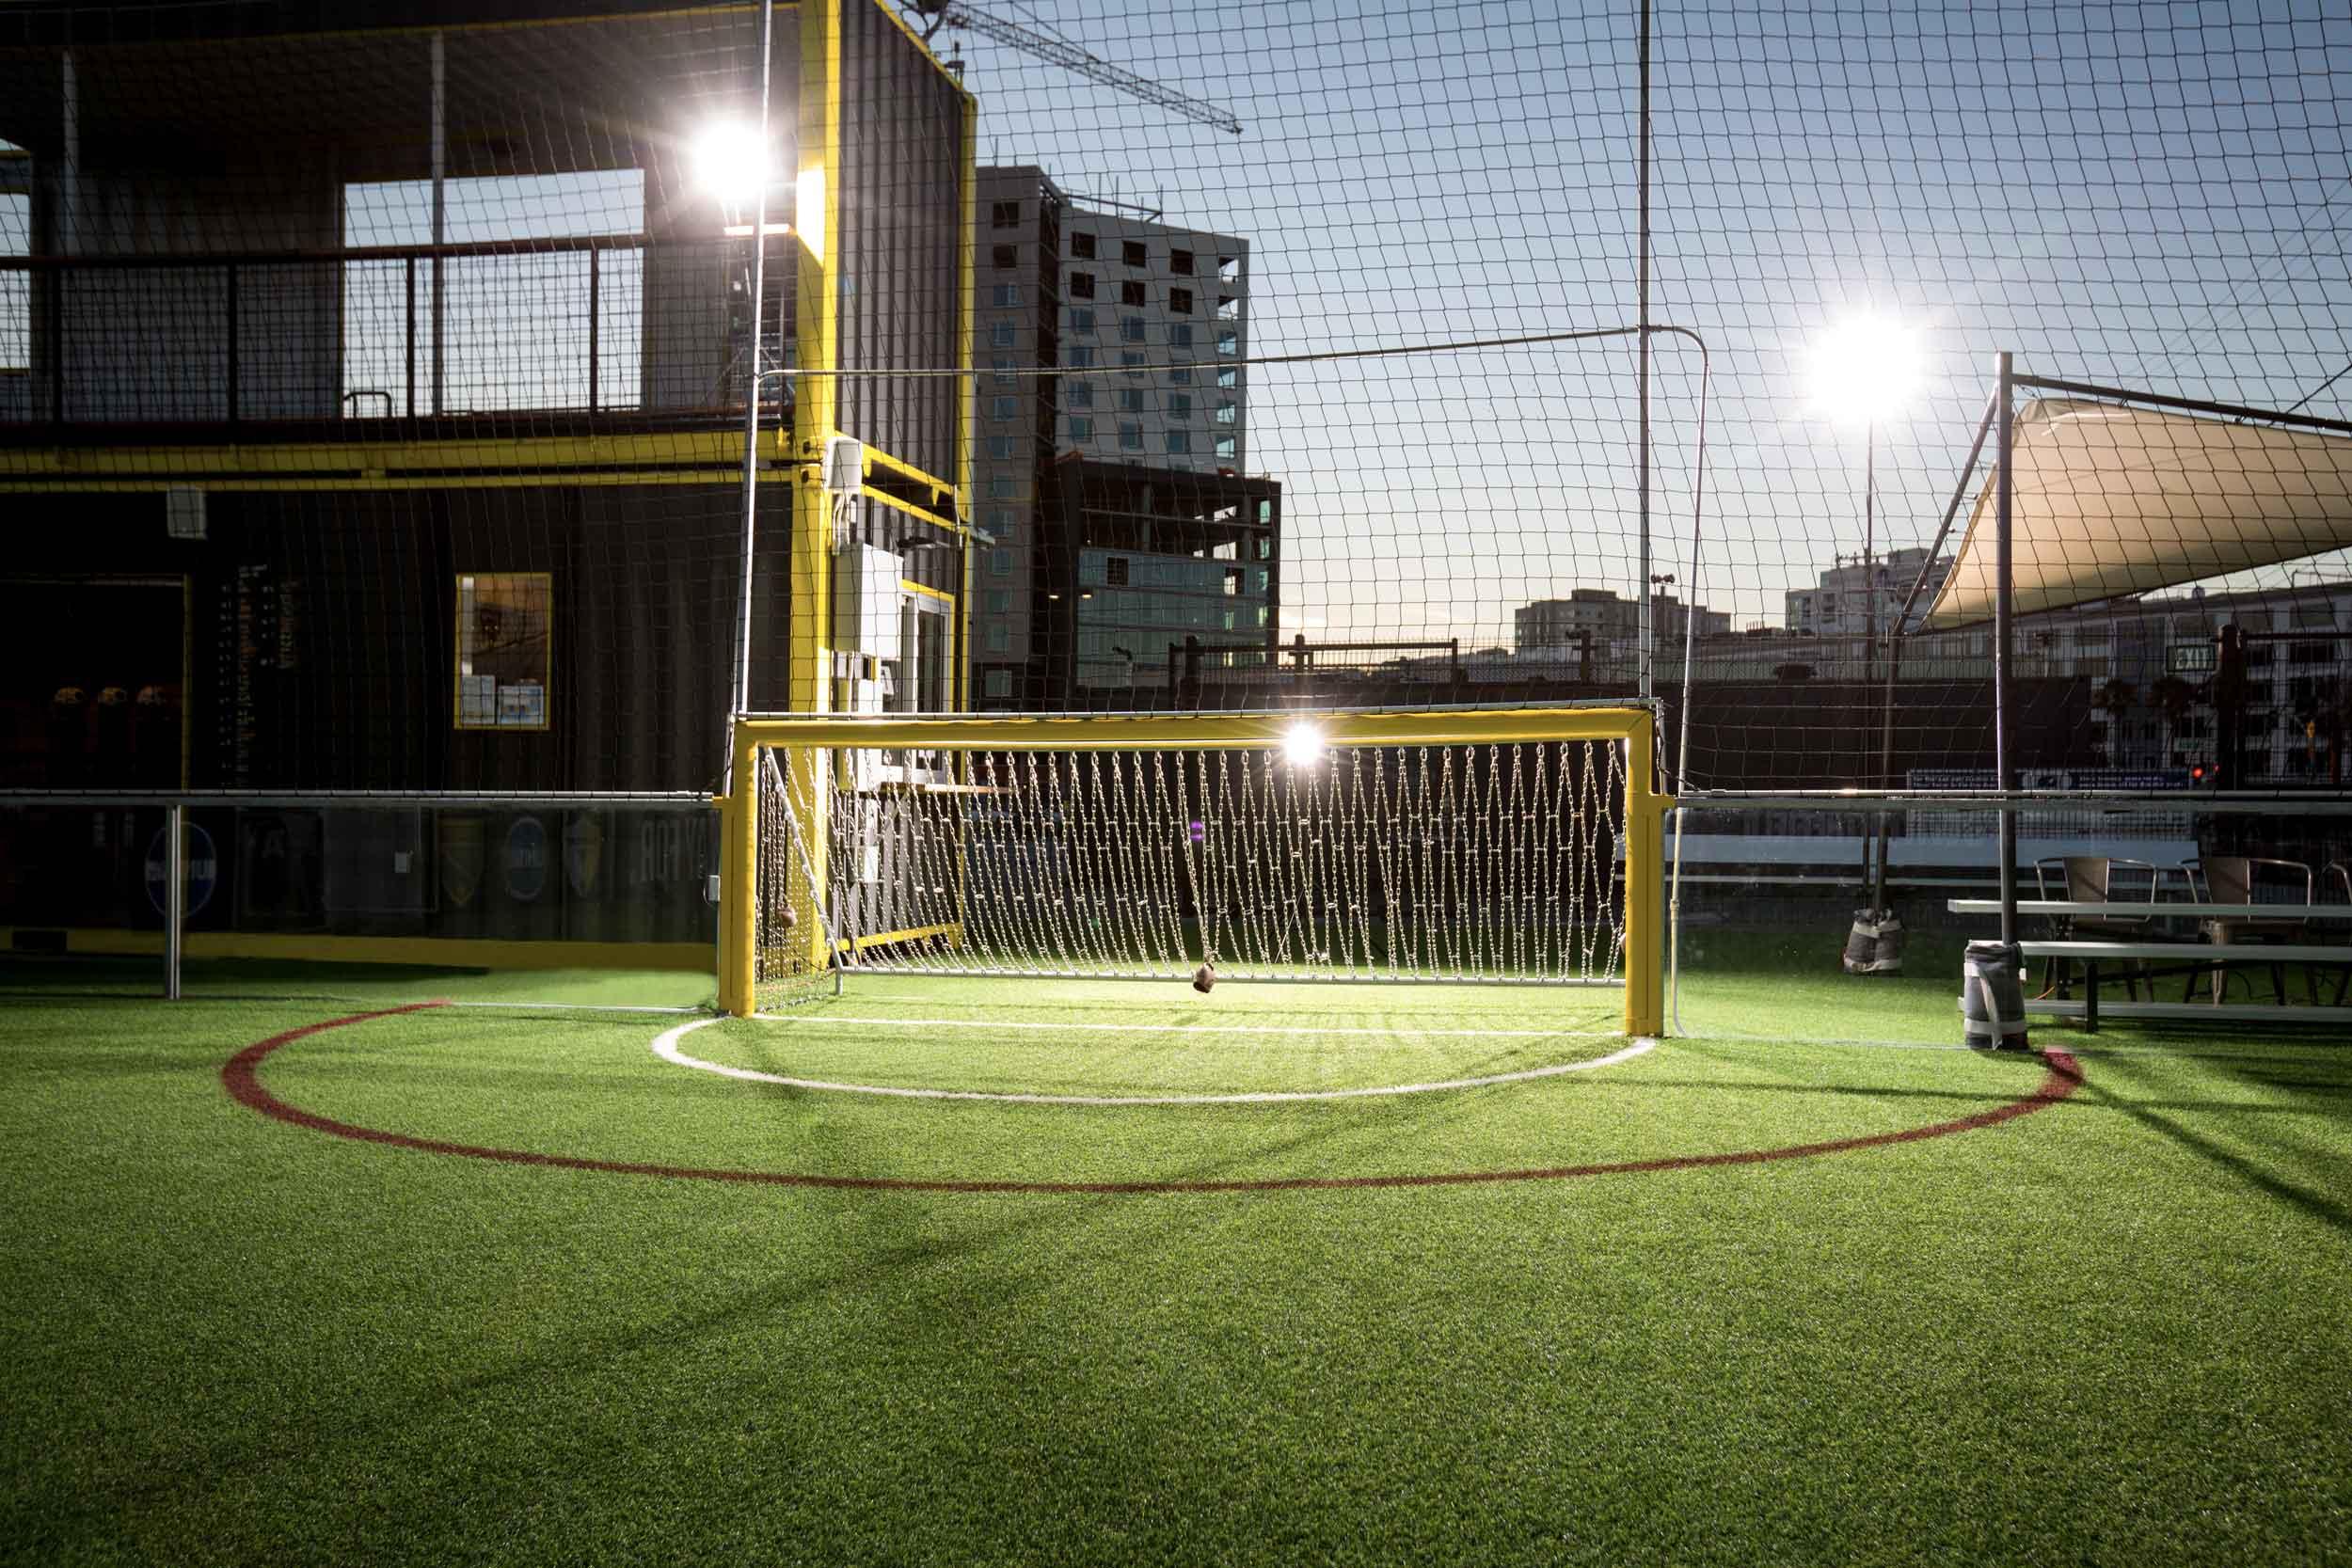 Dusk shot of yellow goal at Urban Soccer Park in San Francisco.